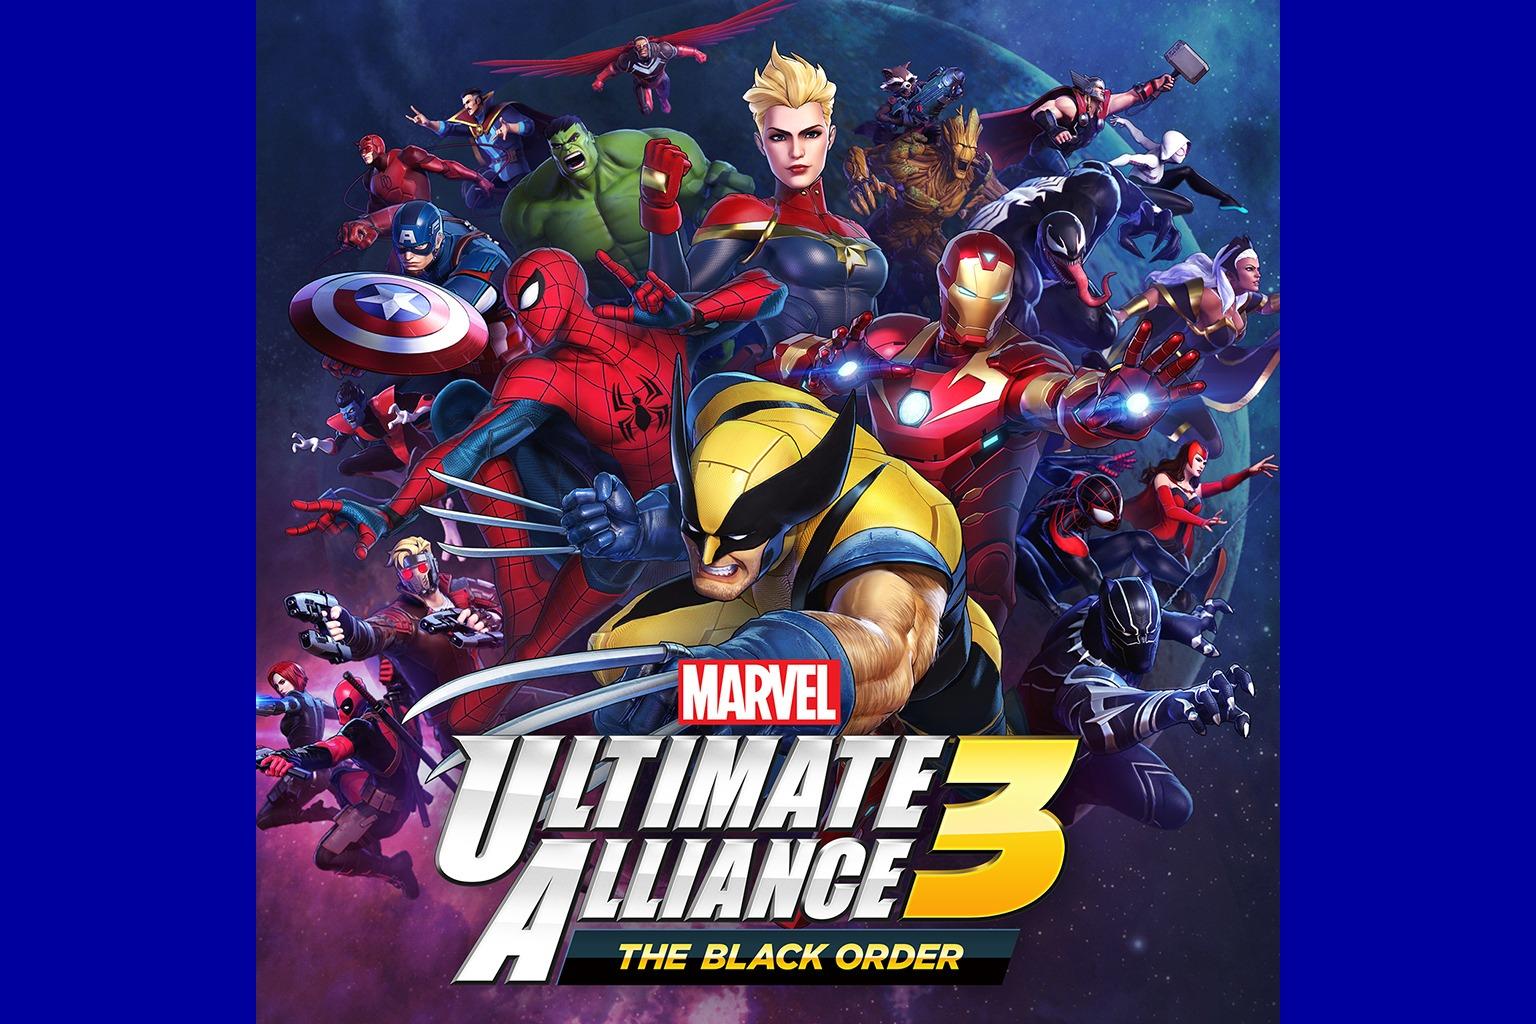 Marvel Ultimate Alliance 3 The Black Order 2